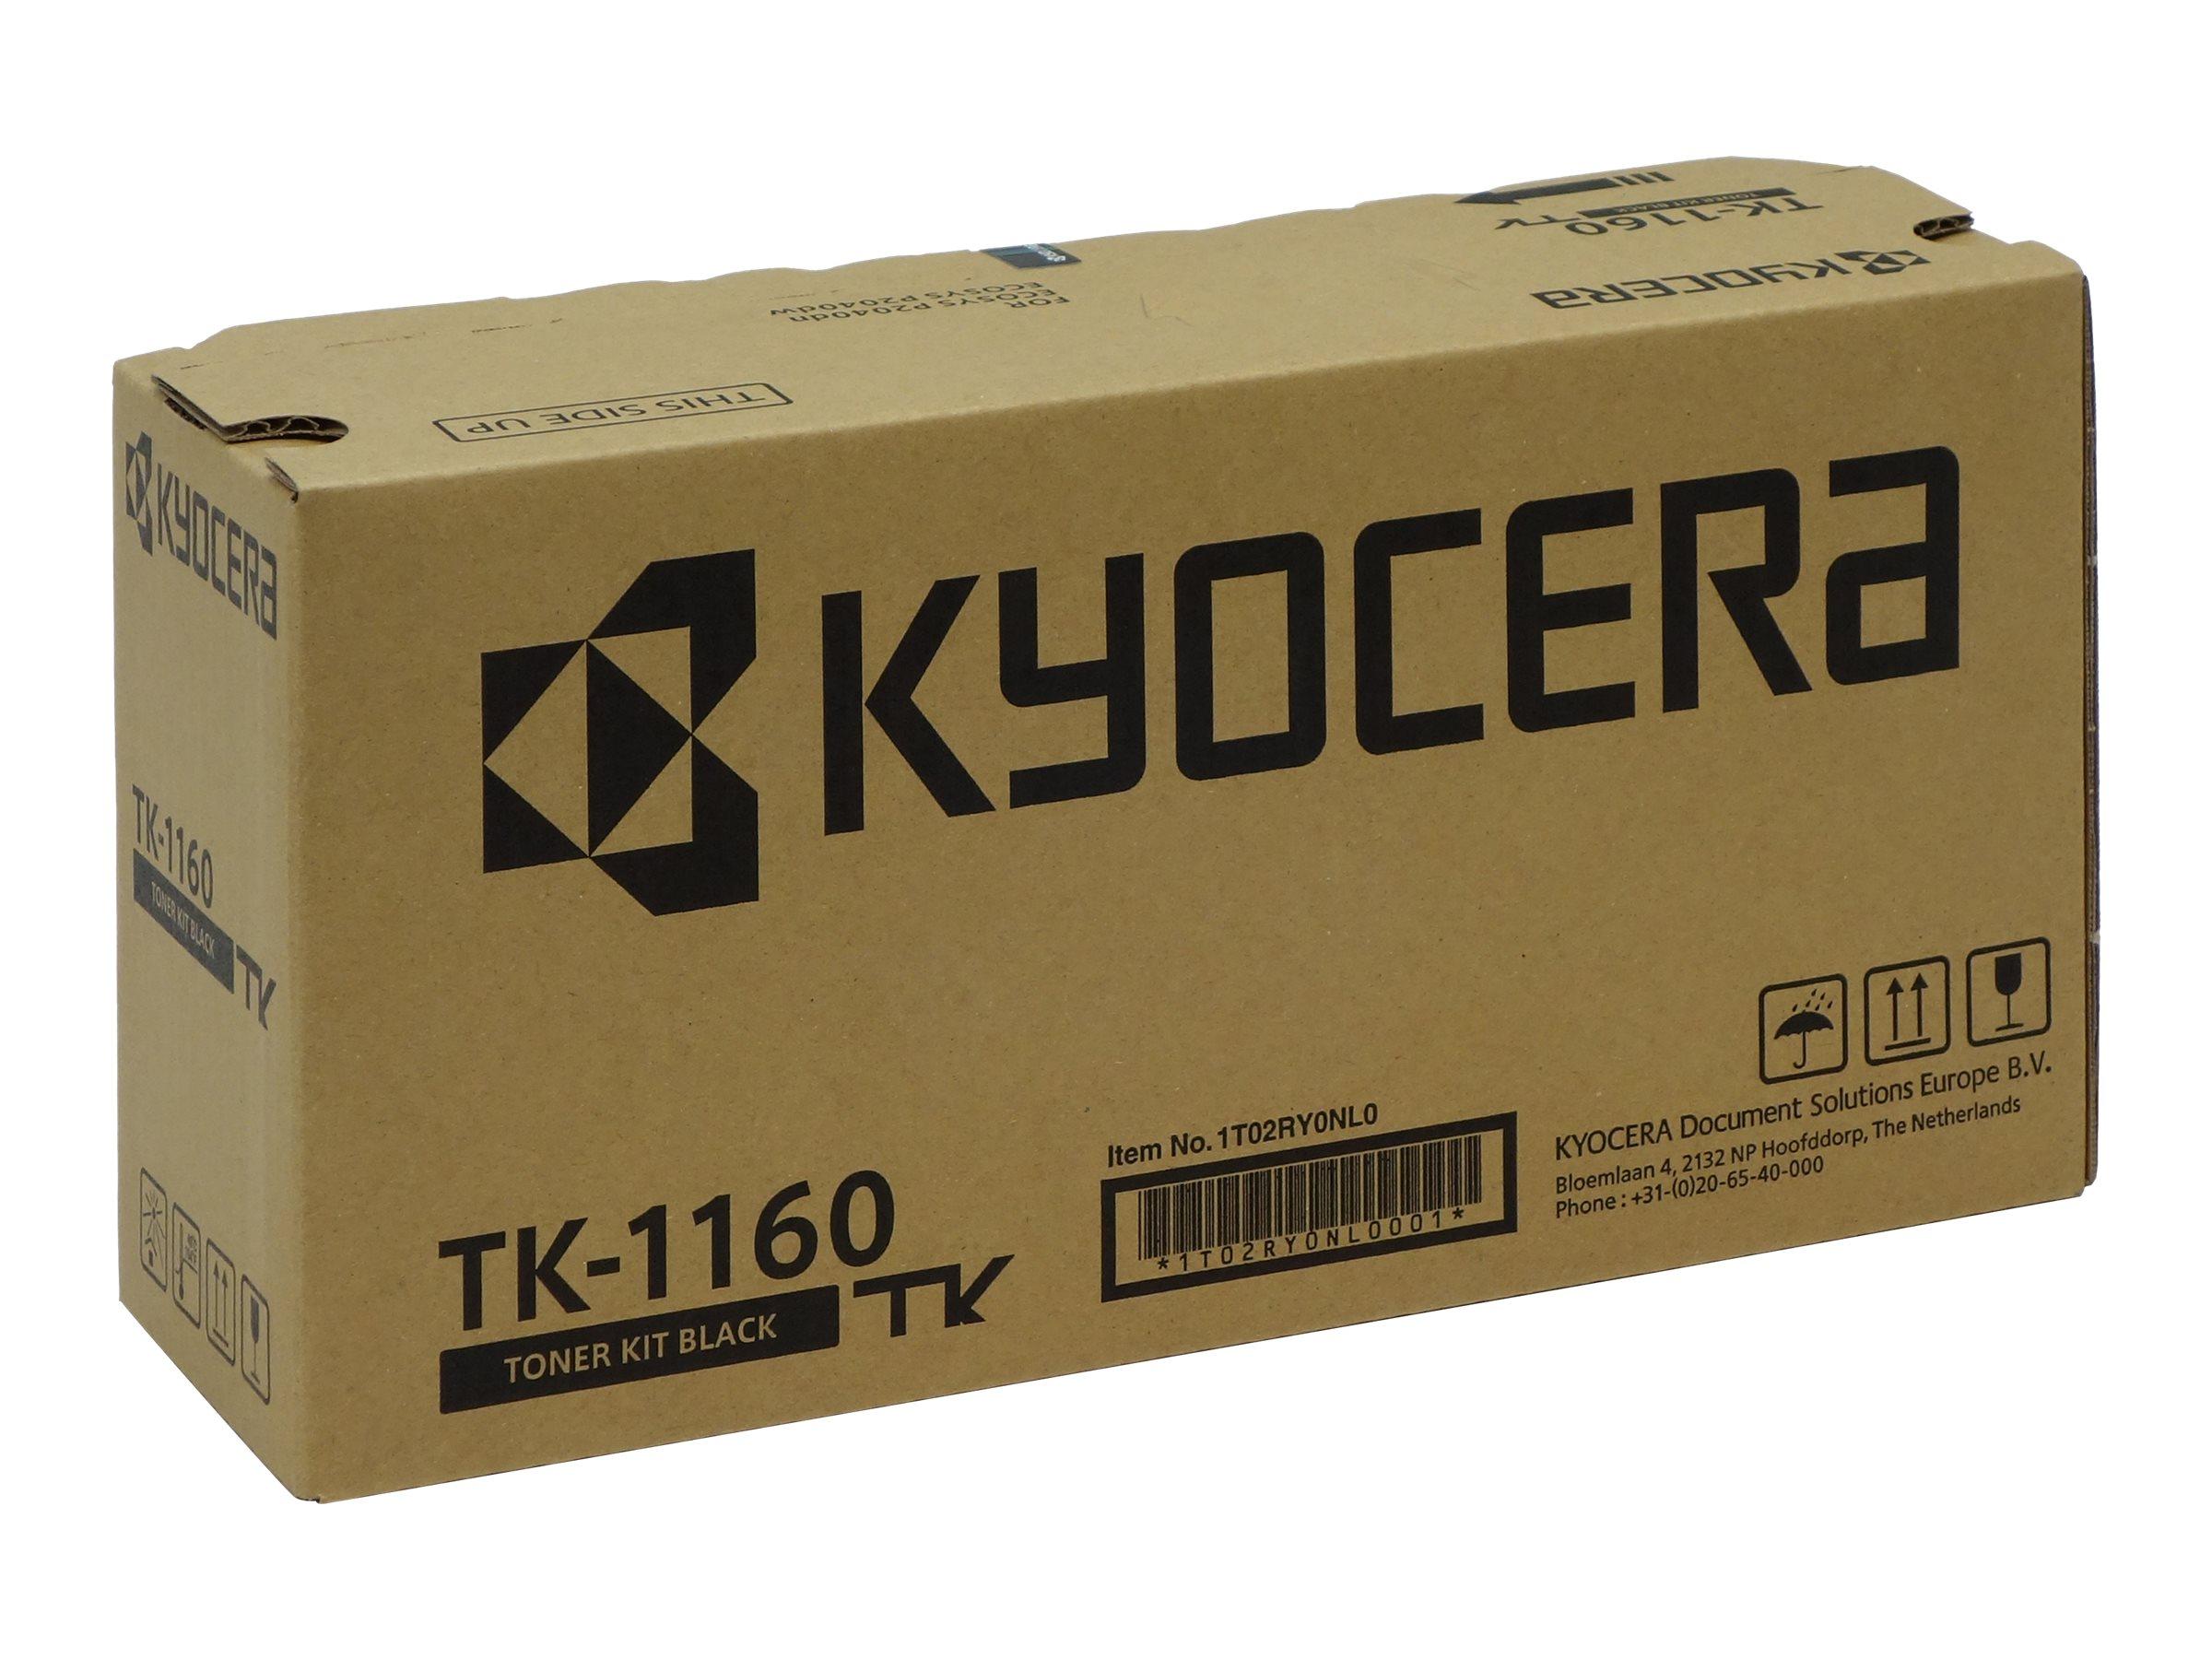 Kyocera 1T02RY0NL0 Lasertoner 7200Seiten Schwarz Lasertoner / Patrone